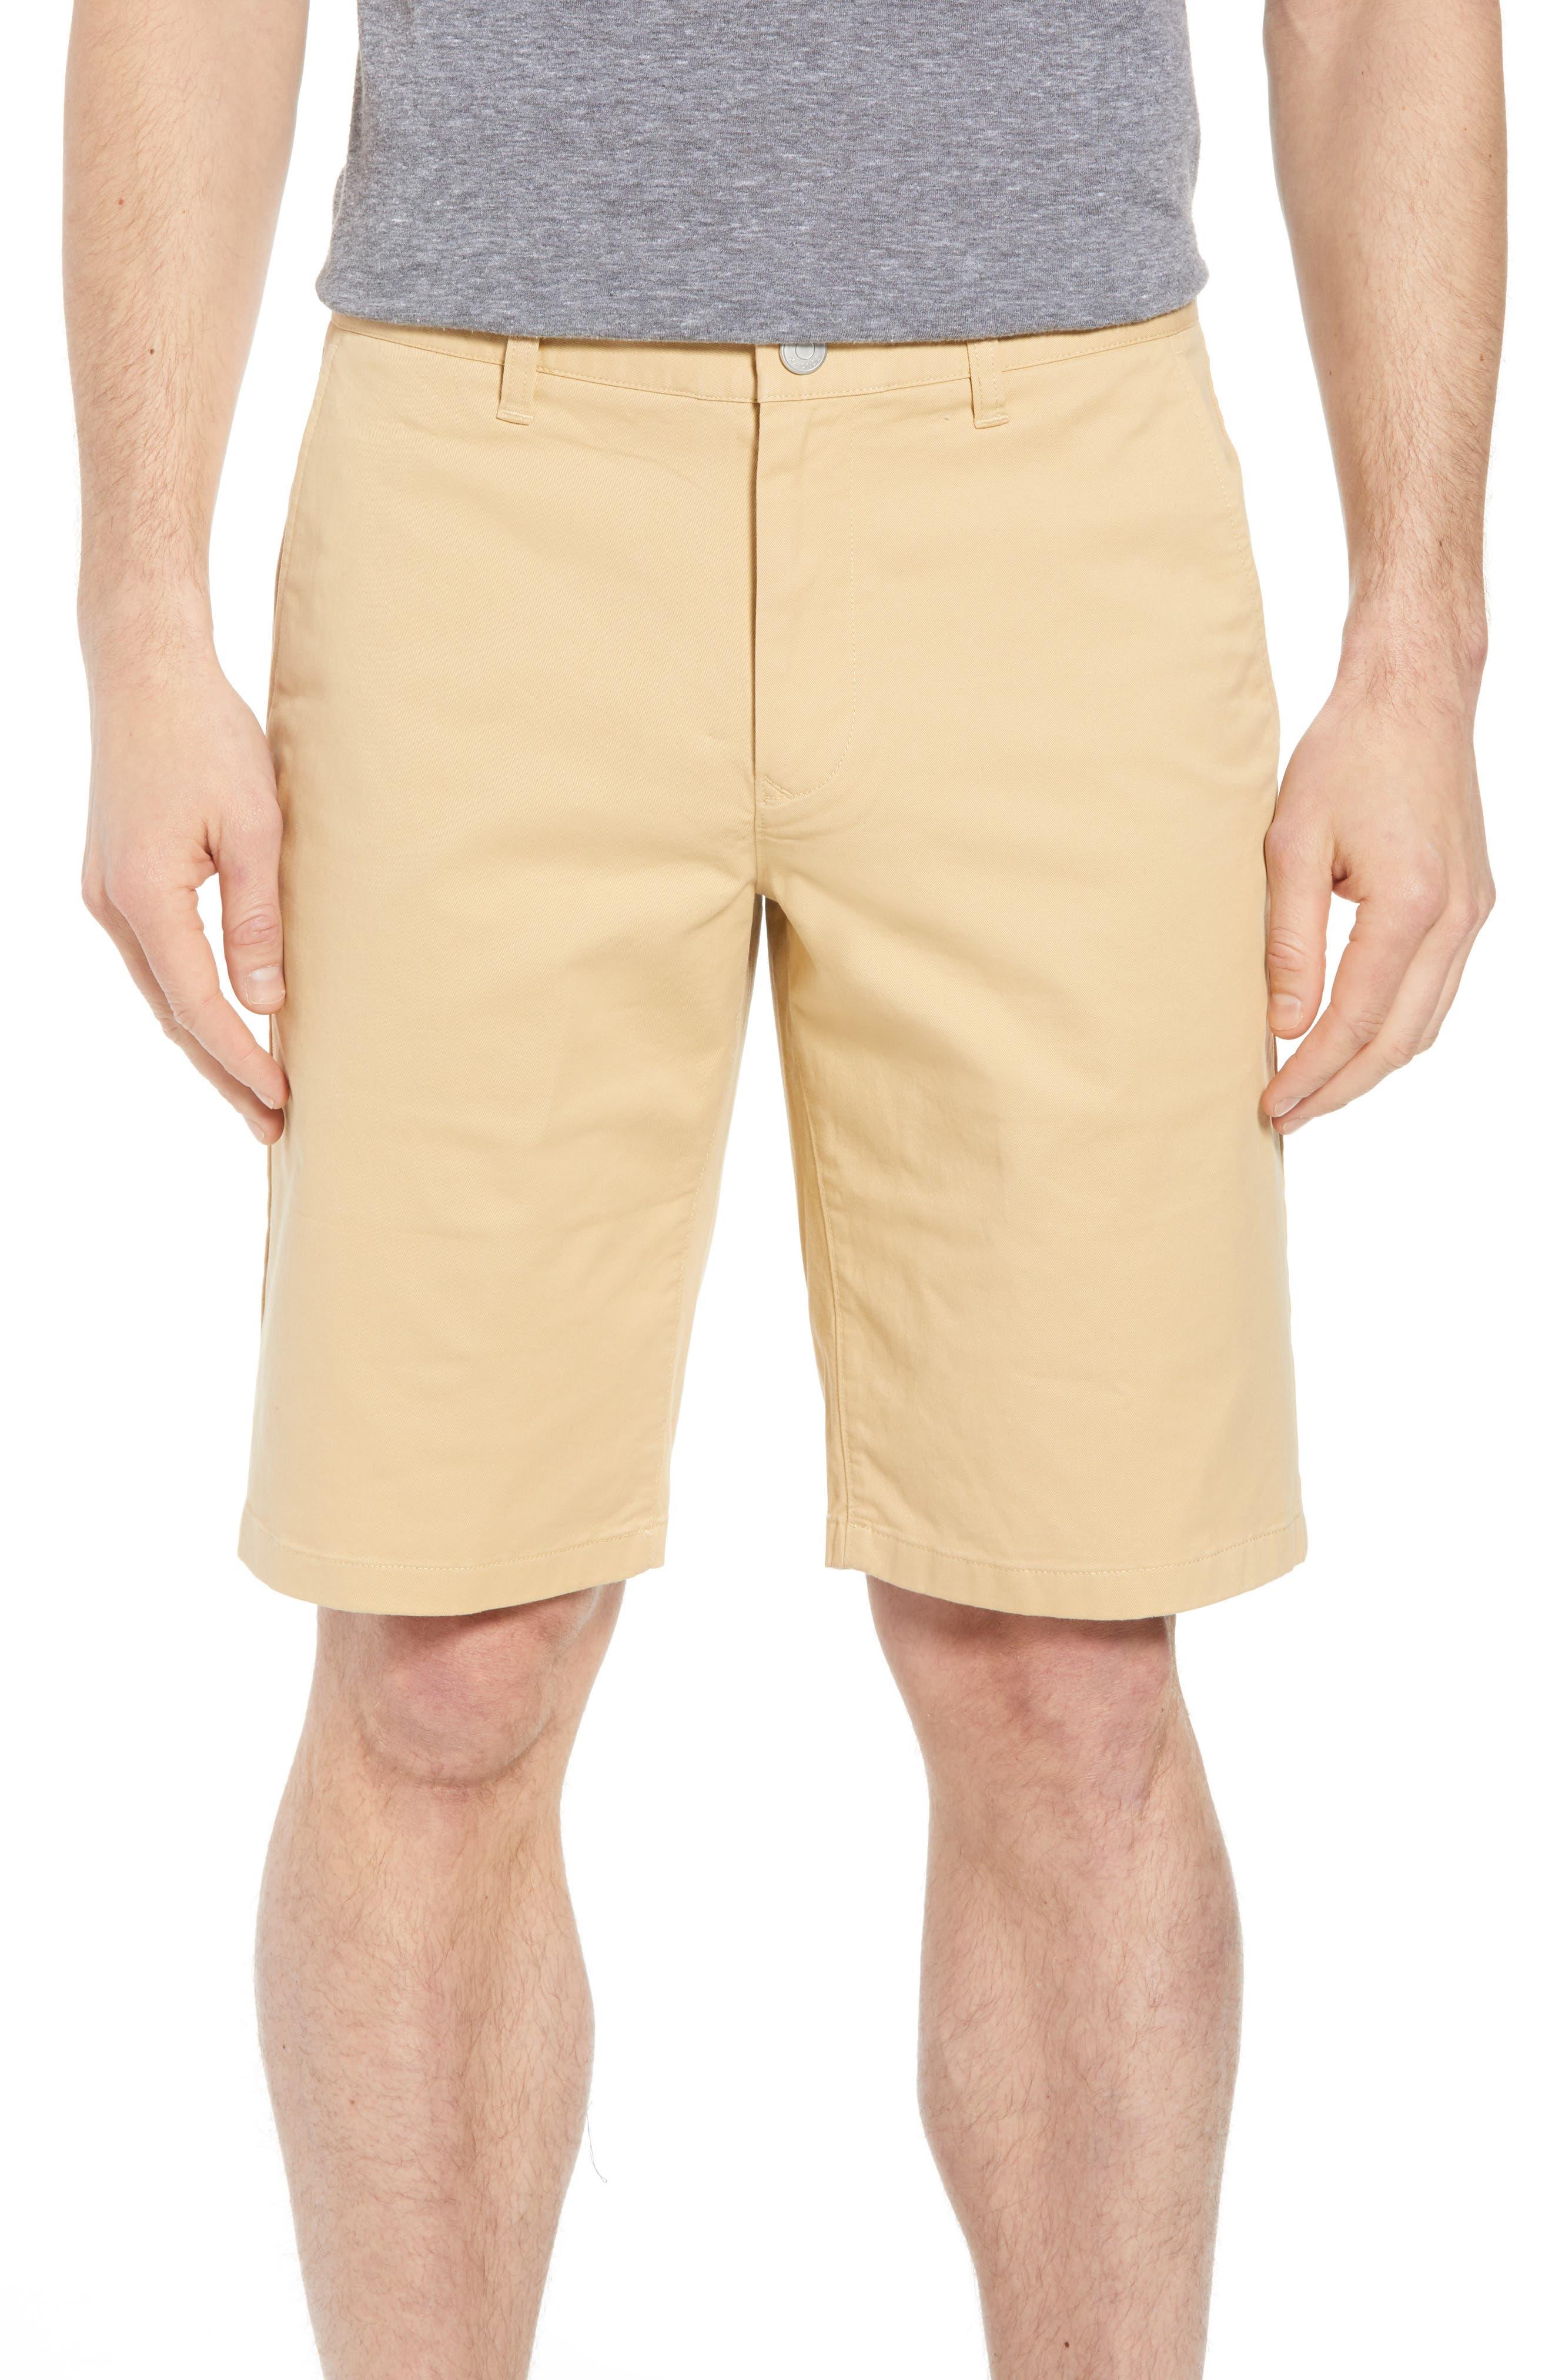 Stretch Washed Chino 11-Inch Shorts,                             Main thumbnail 1, color,                             Gold Khaki